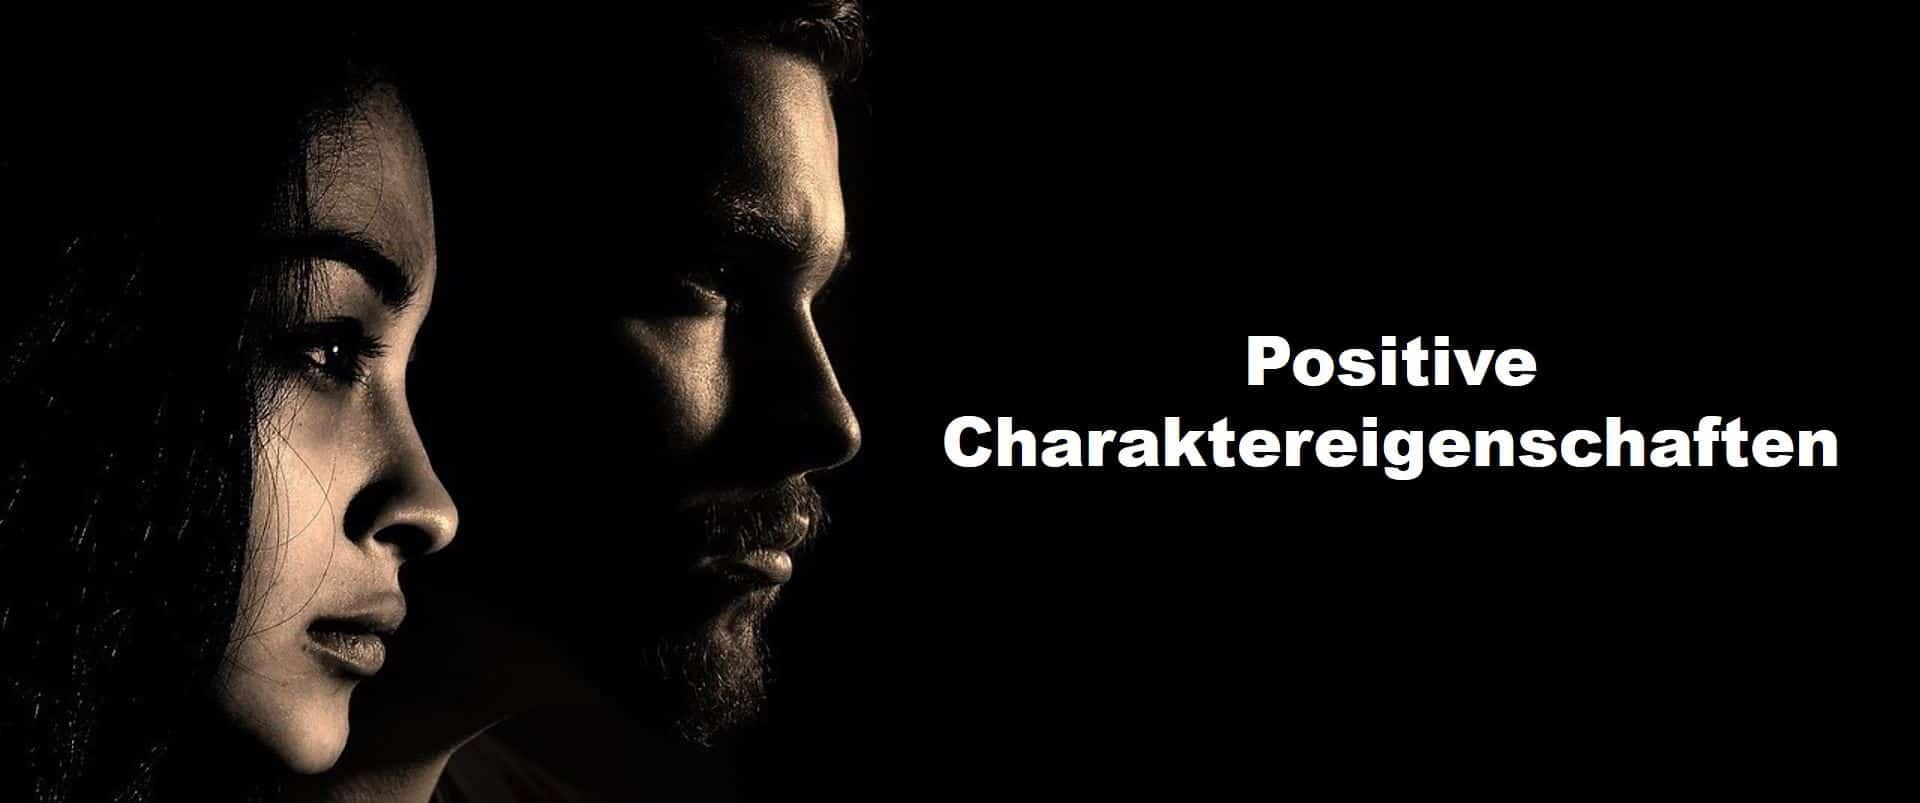 Liste adjektive charaktereigenschaften 199 positive